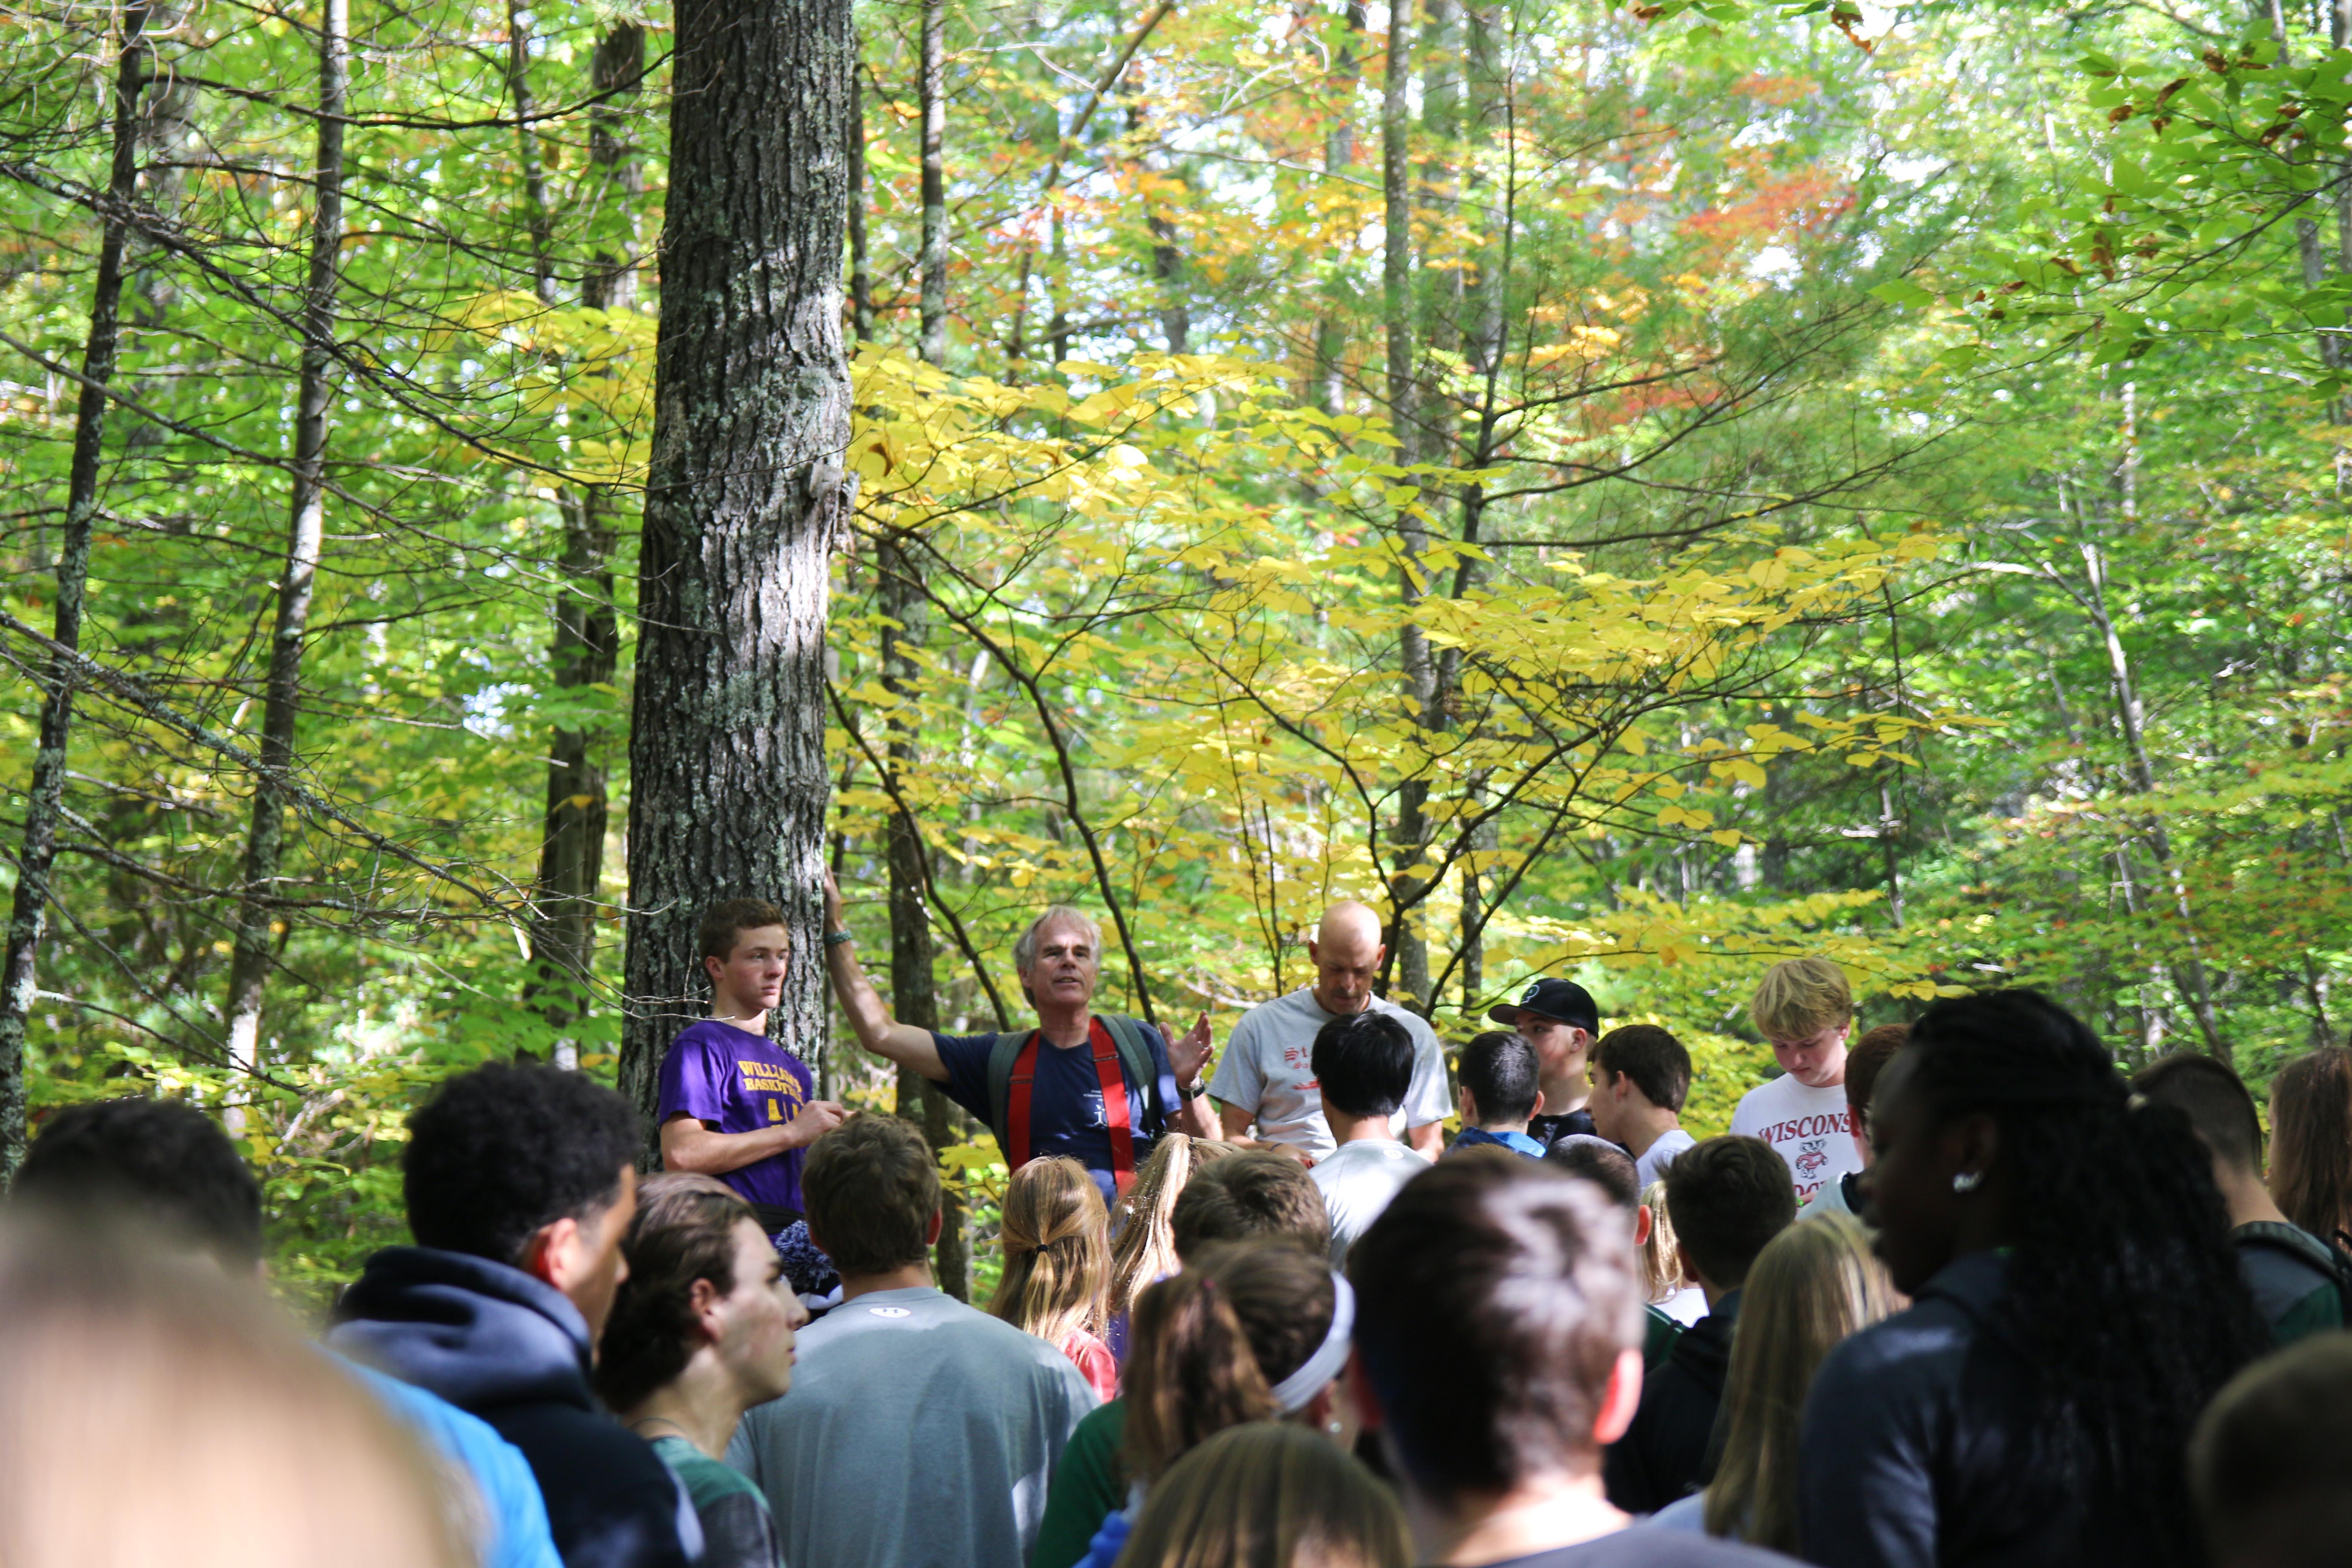 Proctor Academy woodlands